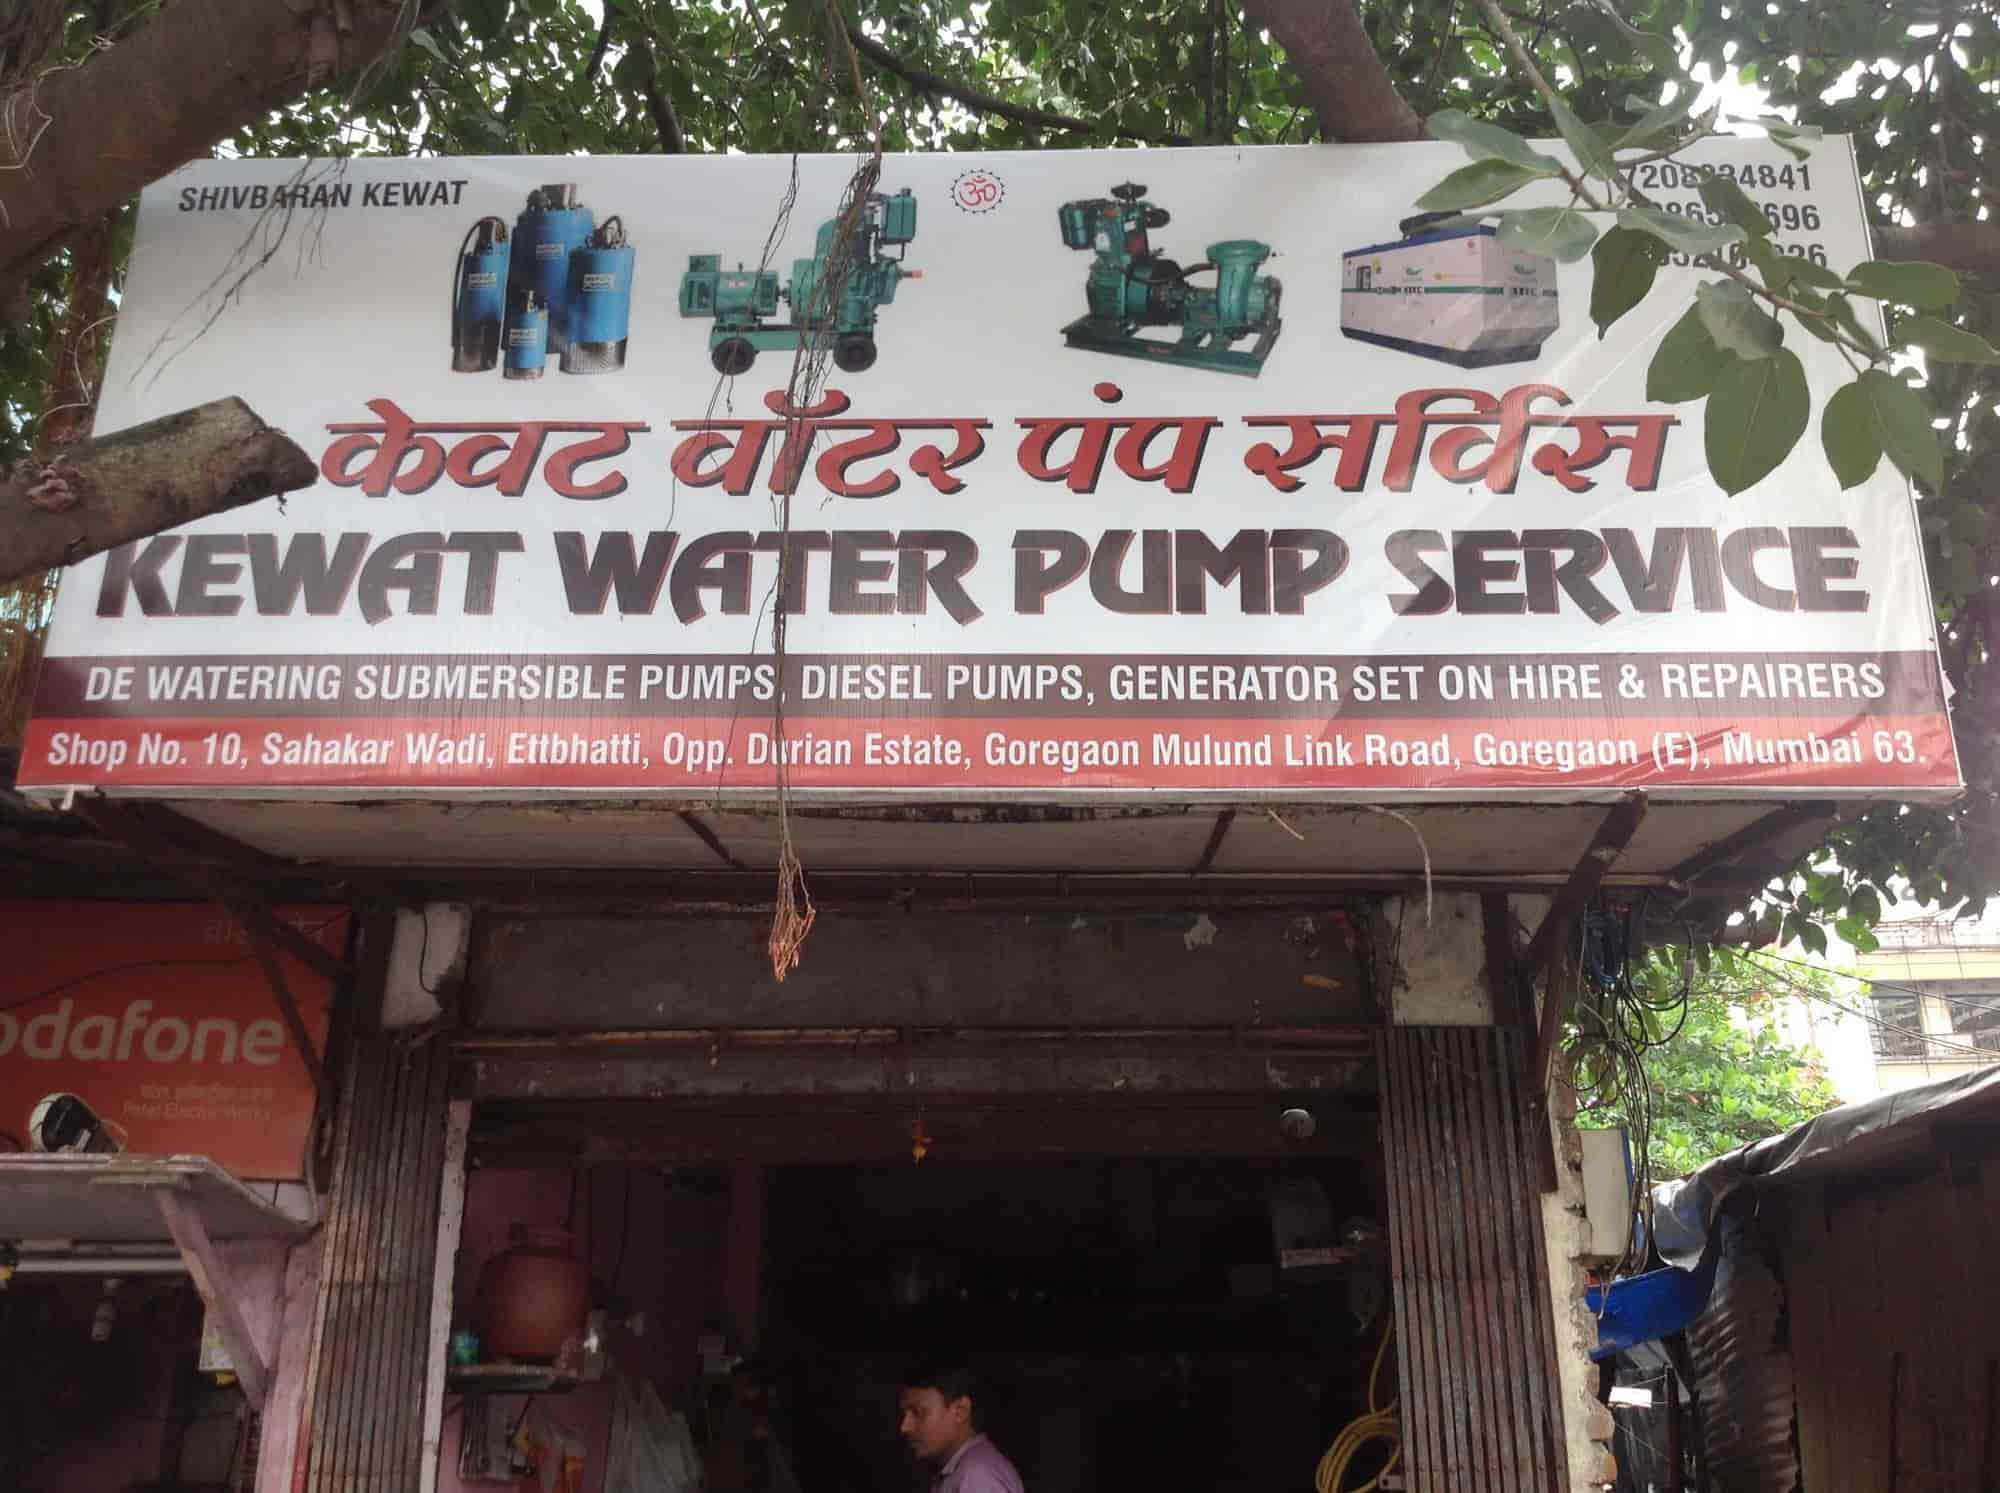 Kewat Water Pump Service